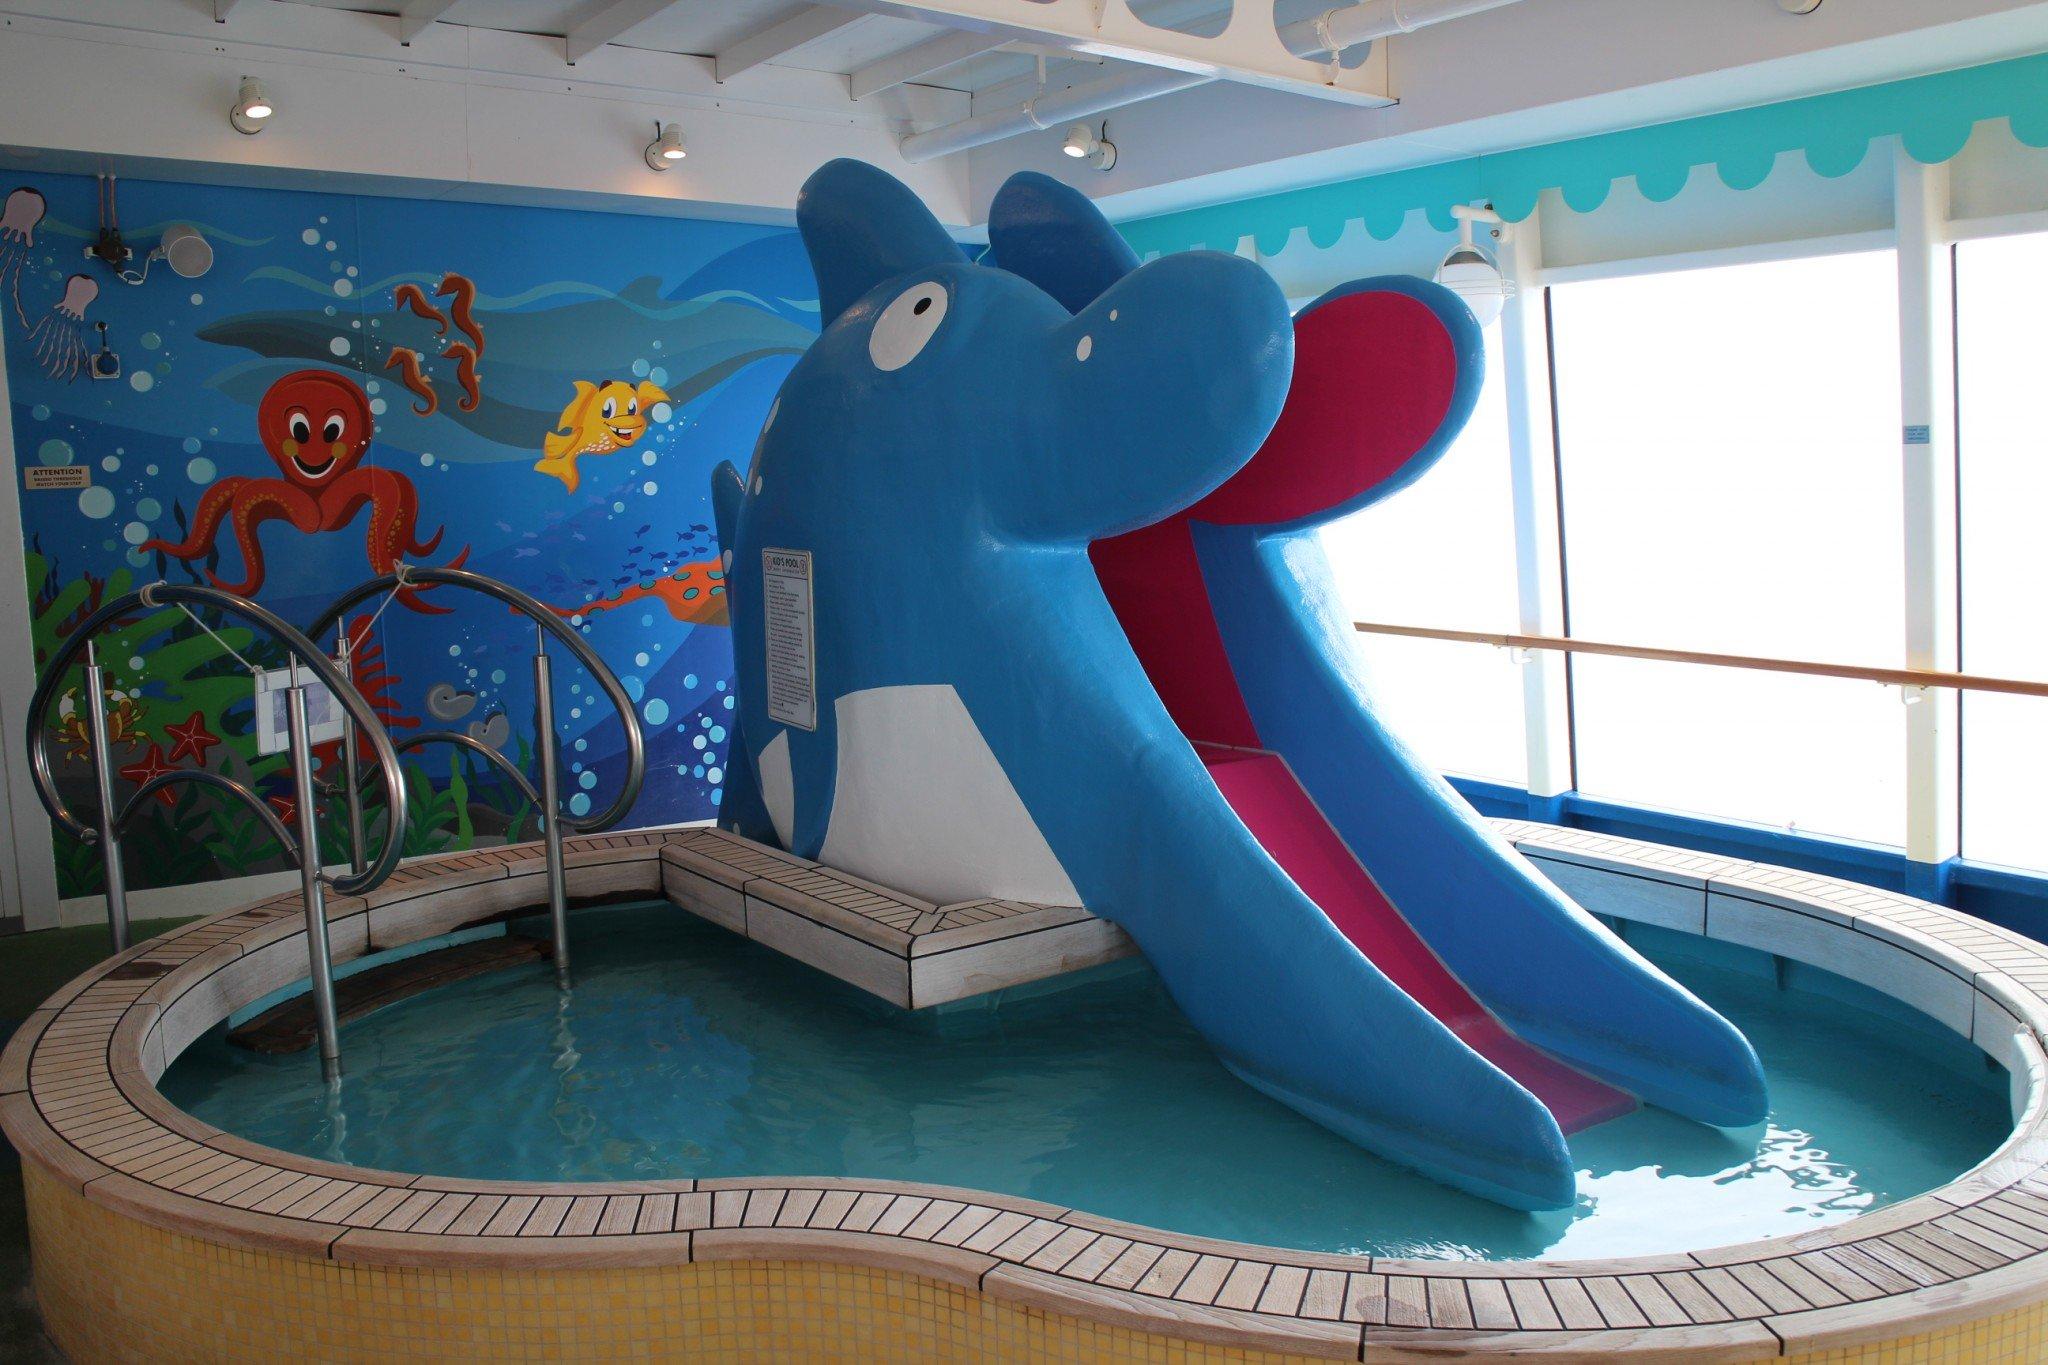 Norwegian Jewel kid's pool